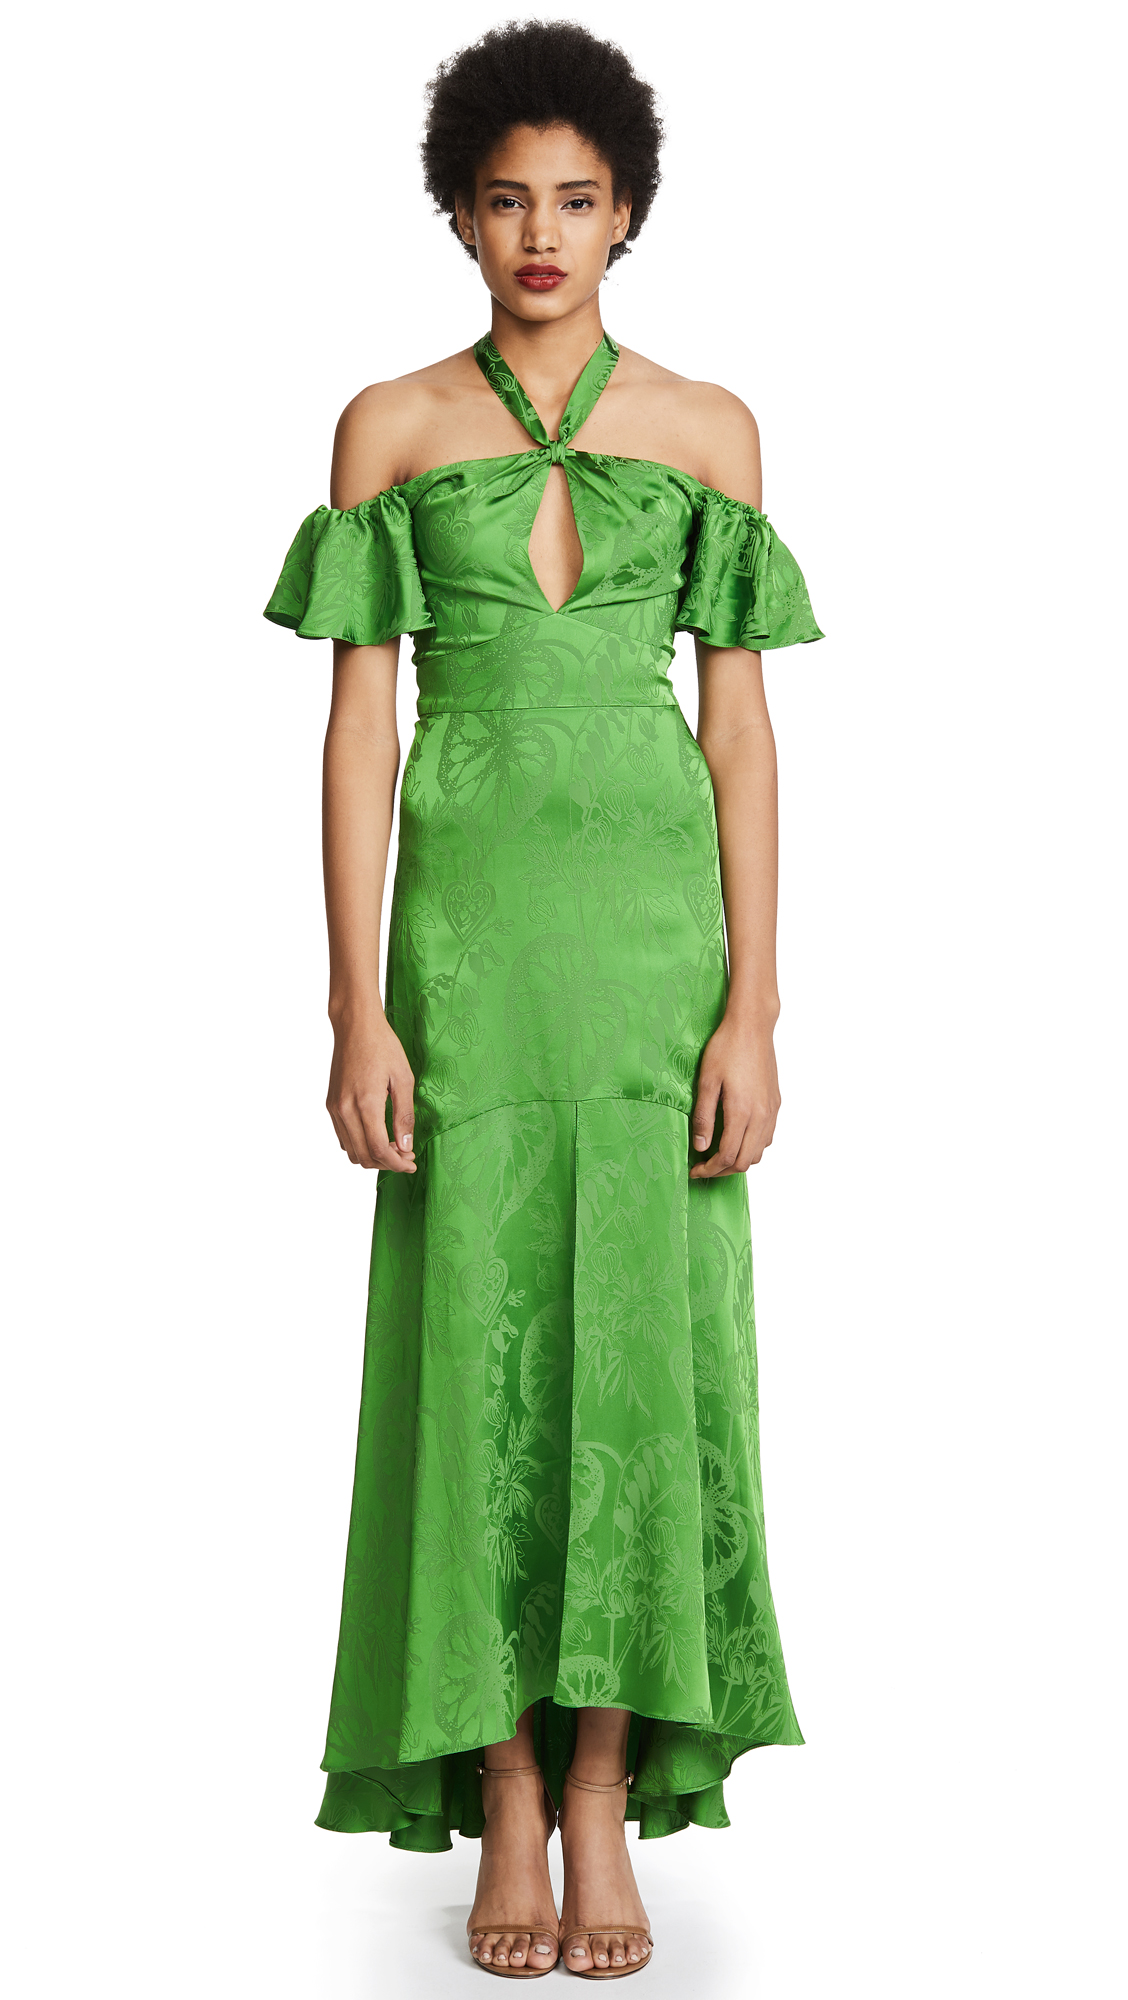 Temperley London Orbit Dress